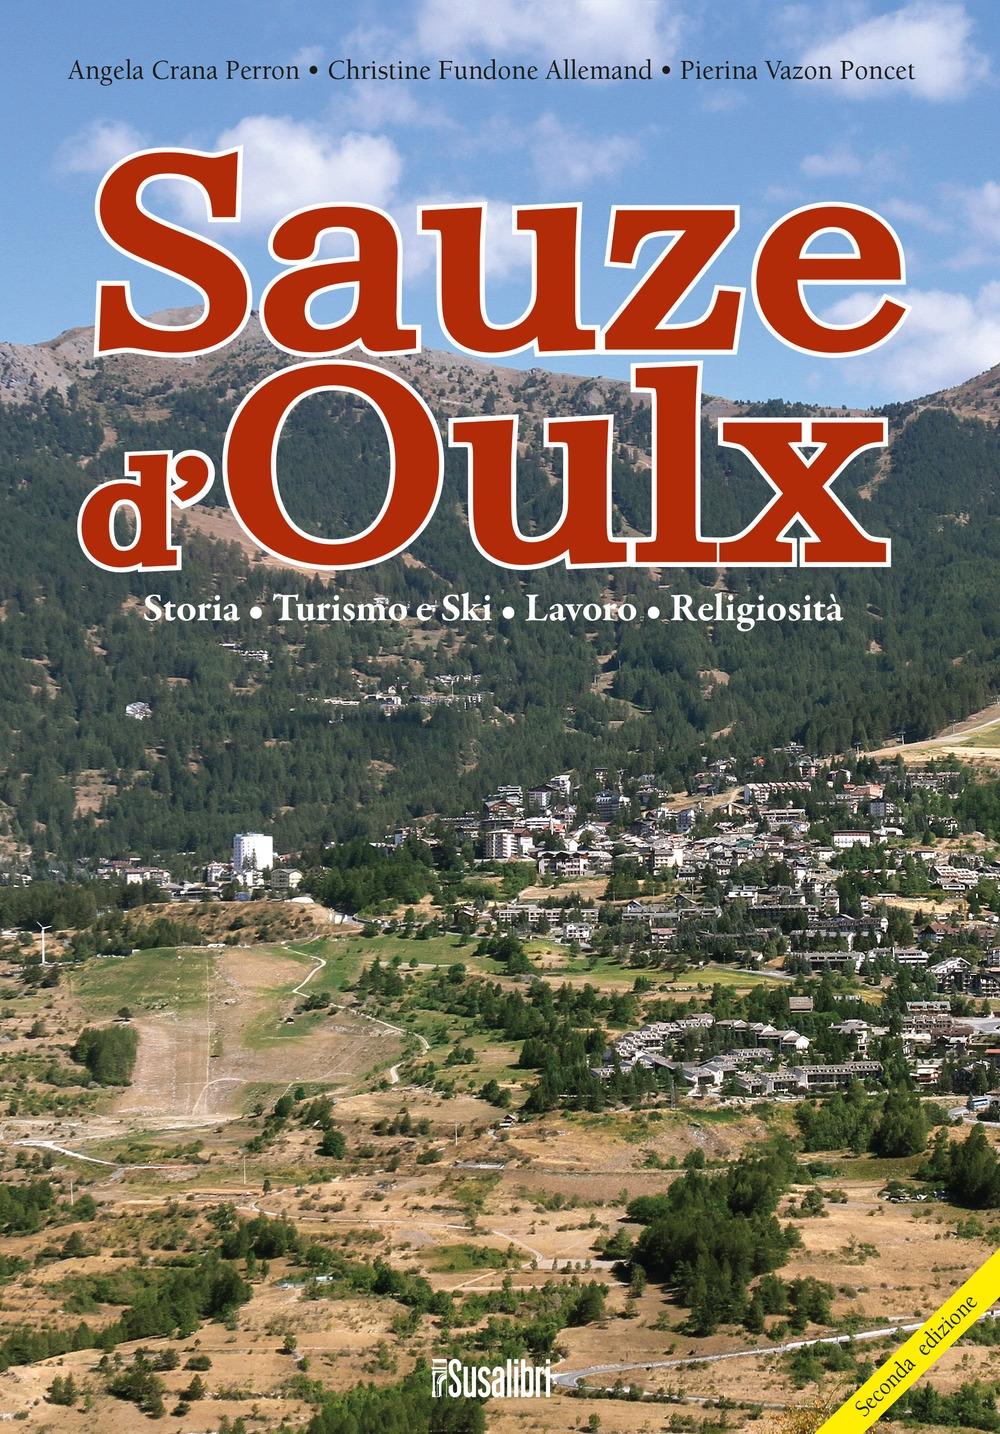 Saouze d'Oulx. Storia, turismo e ski, lavoro, religiosità